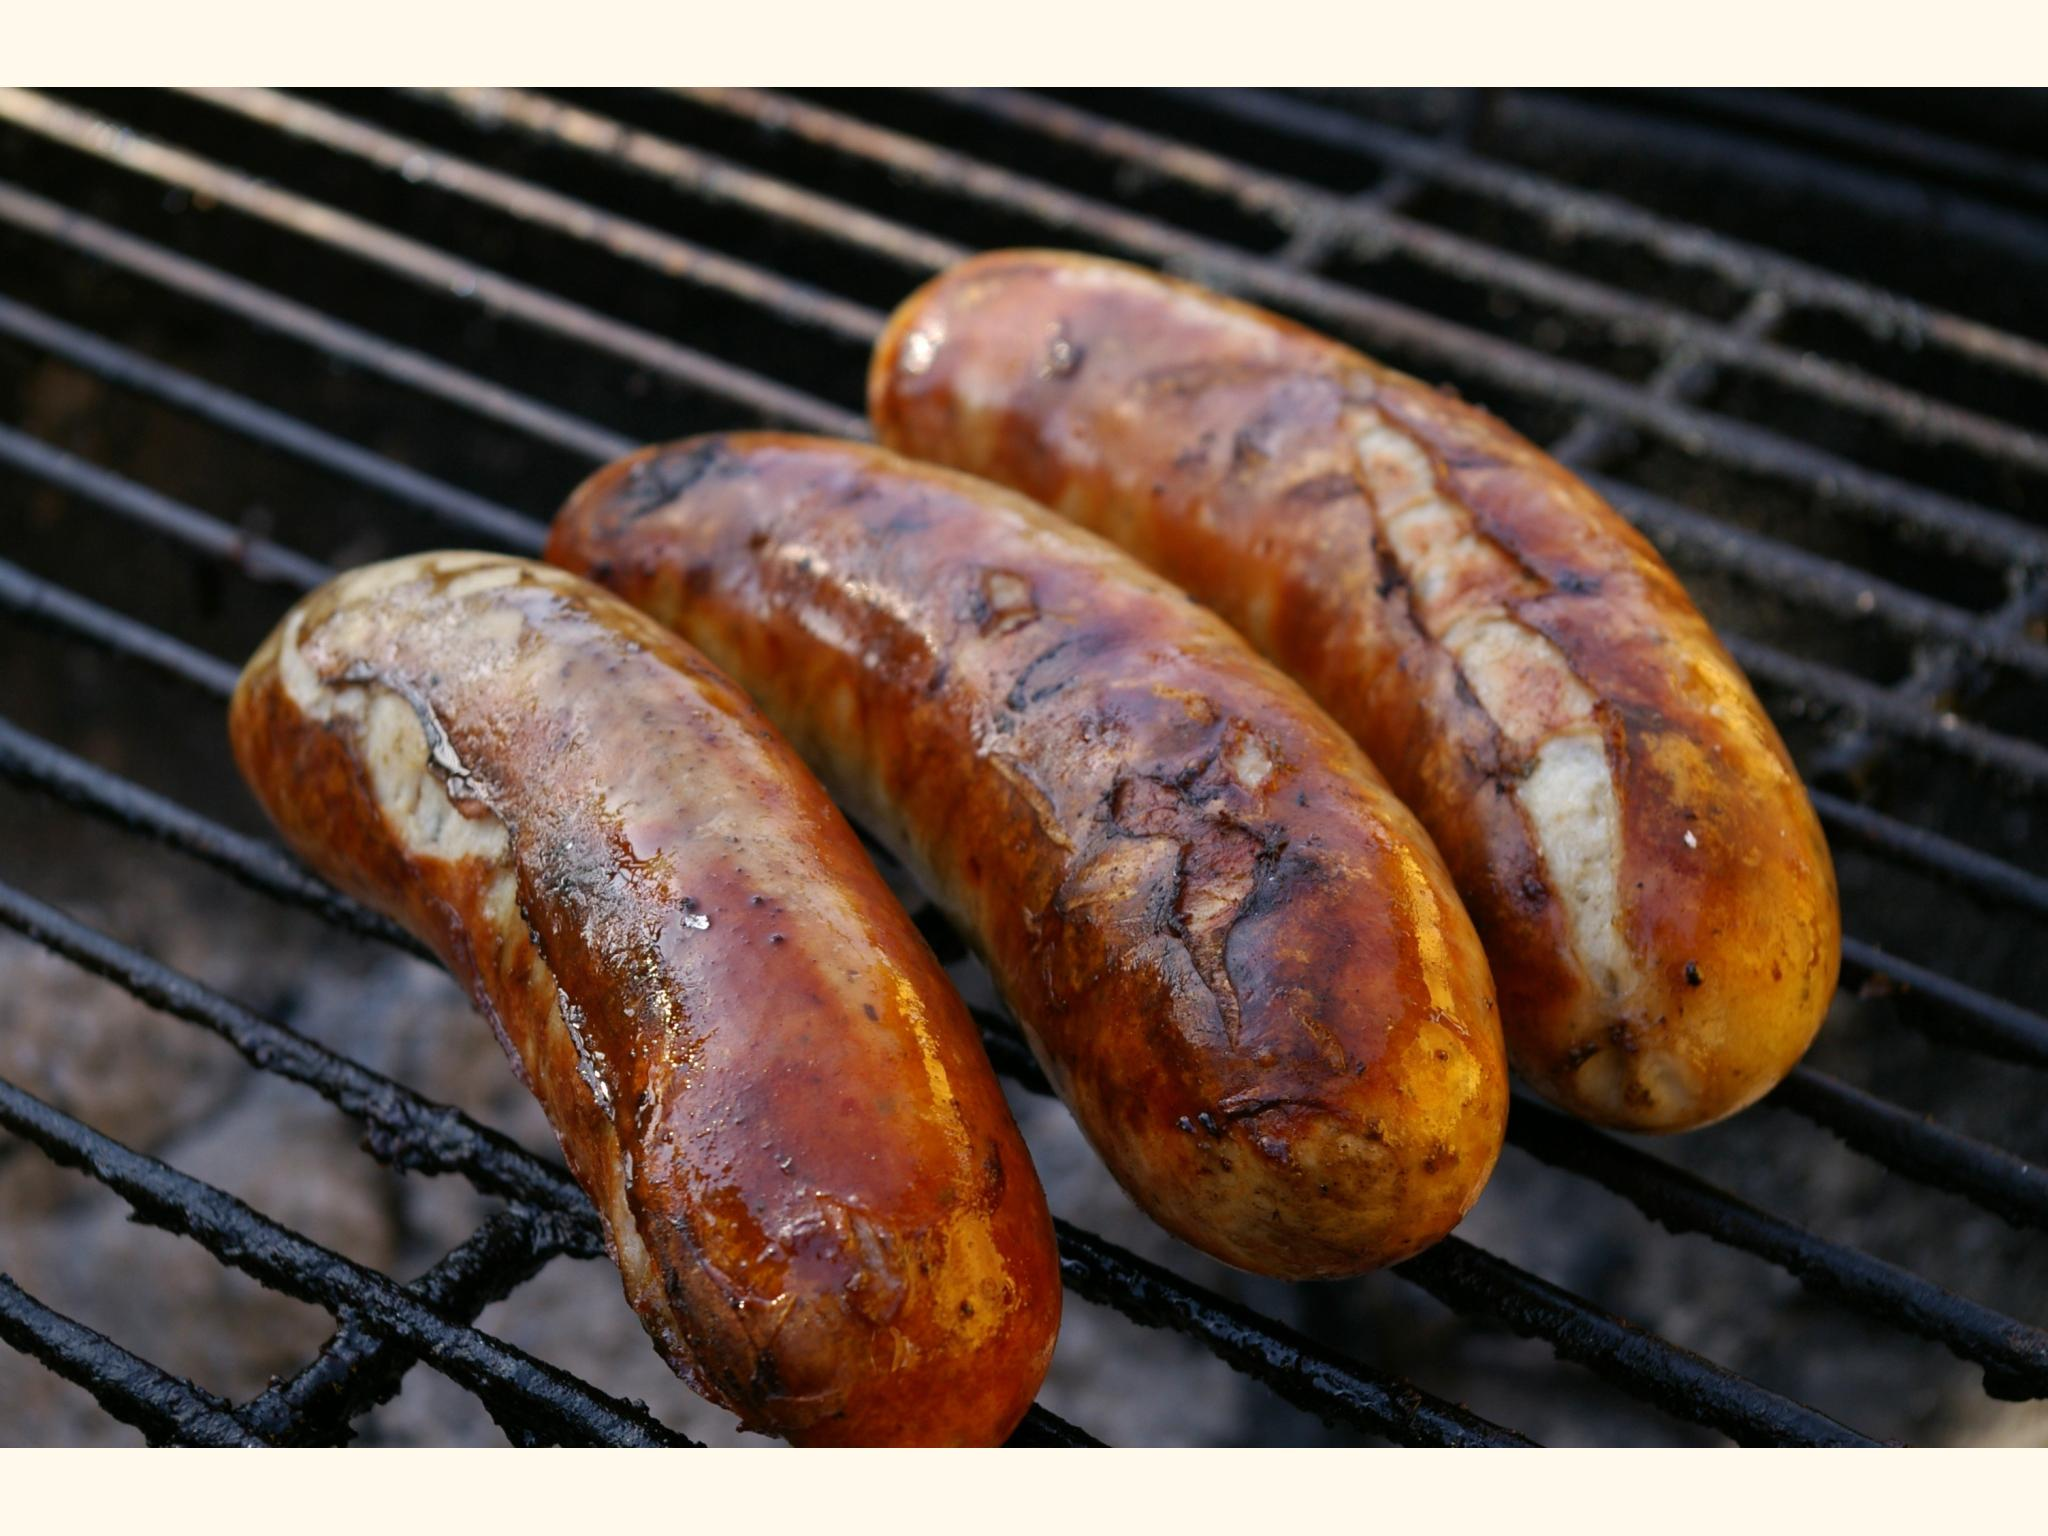 Premium Pork Sausage Seasoning - 250g (makes a 10kg batch)